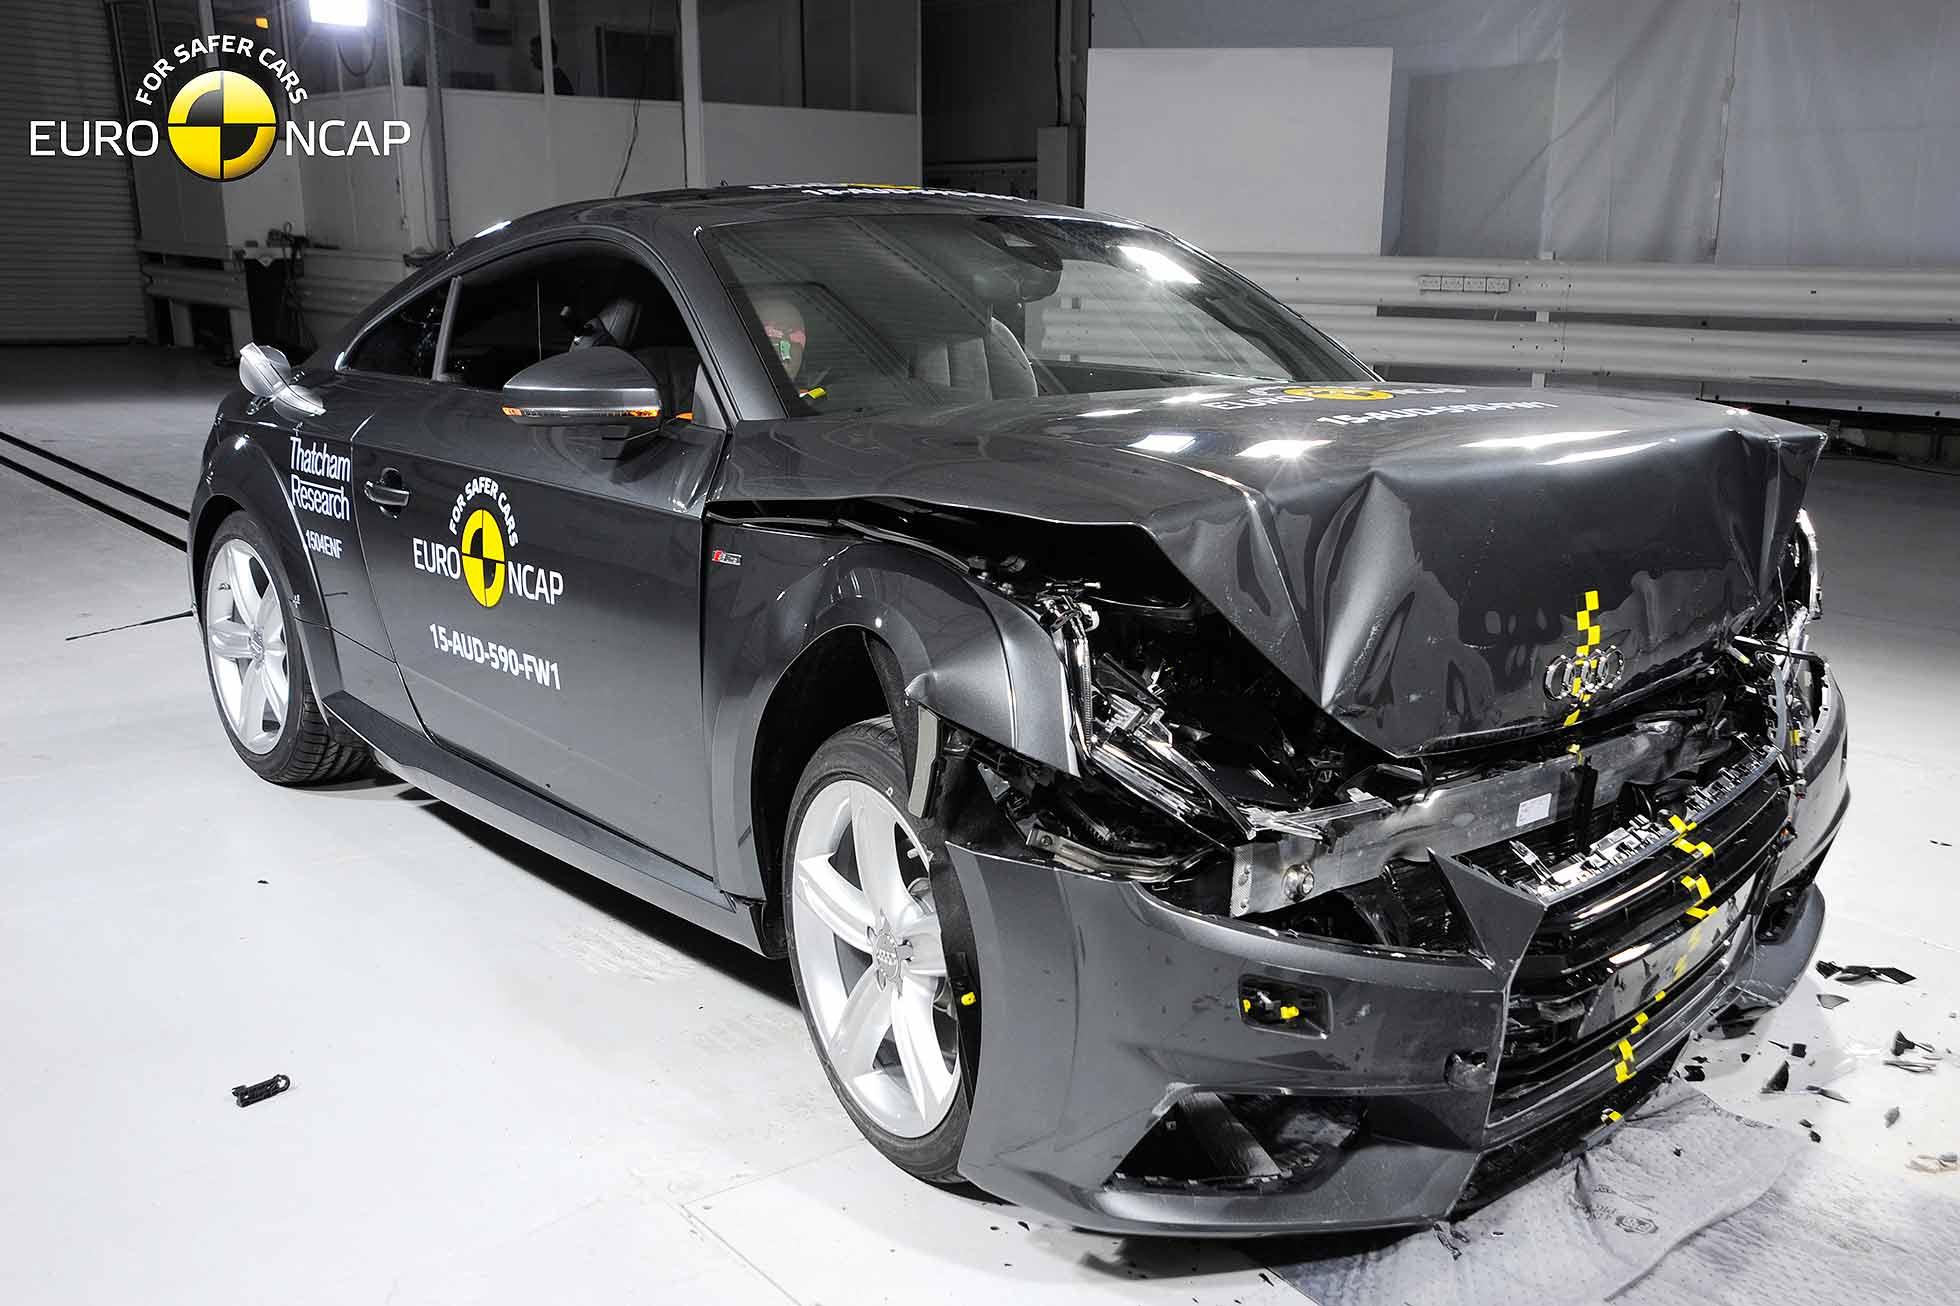 audi tt scores four stars in euro ncap crash test motoring research. Black Bedroom Furniture Sets. Home Design Ideas